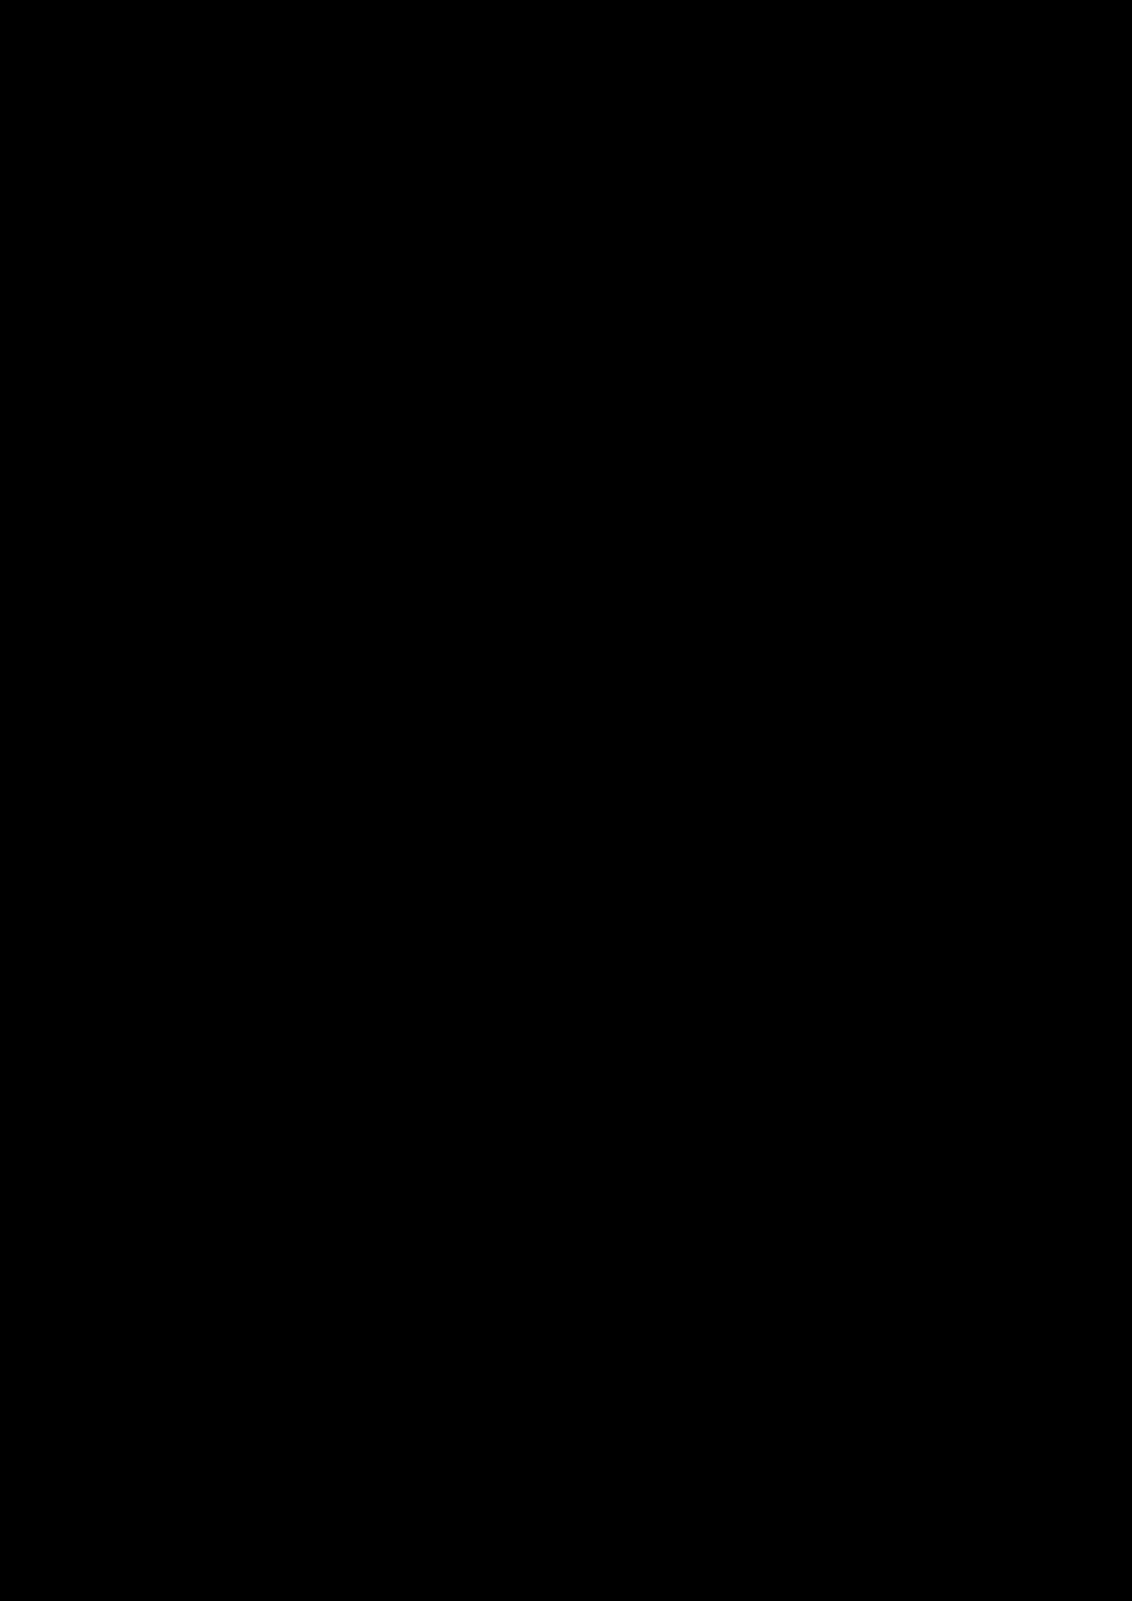 Ispoved Pervogo Boga slide, Image 2